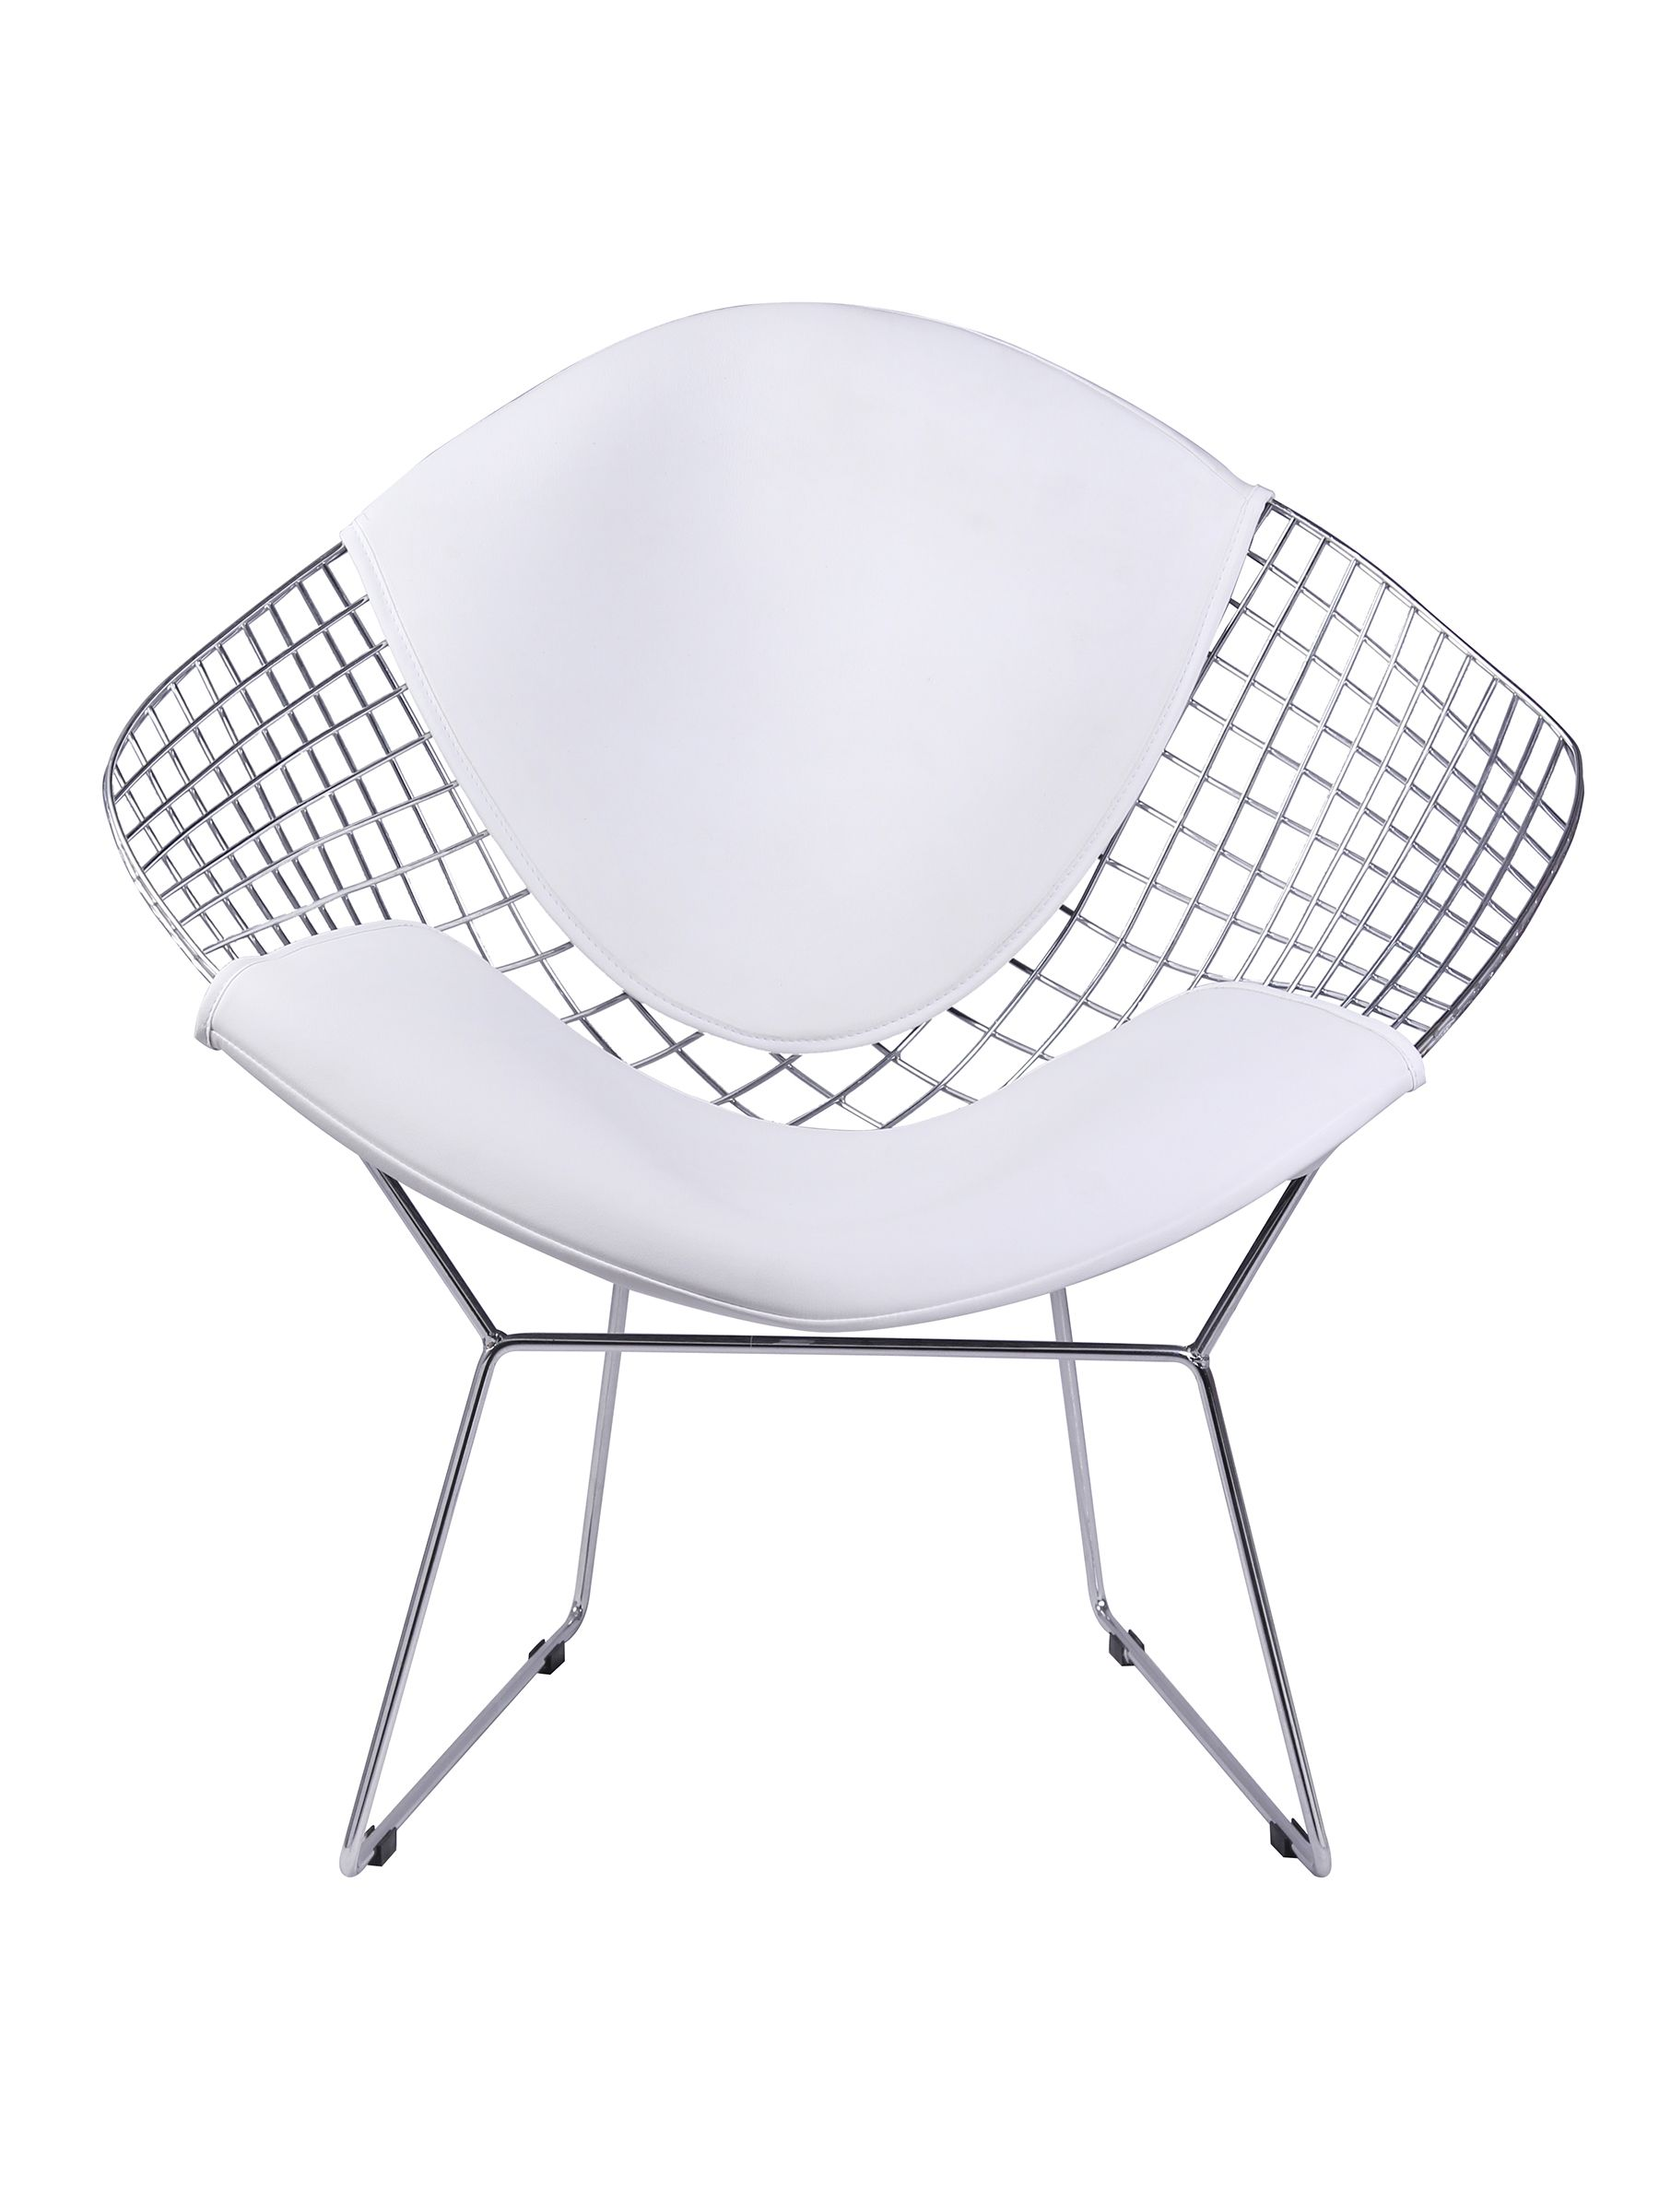 Davy Metal Chair in Chrome Description: Chrome Steel - NPD  Comfy